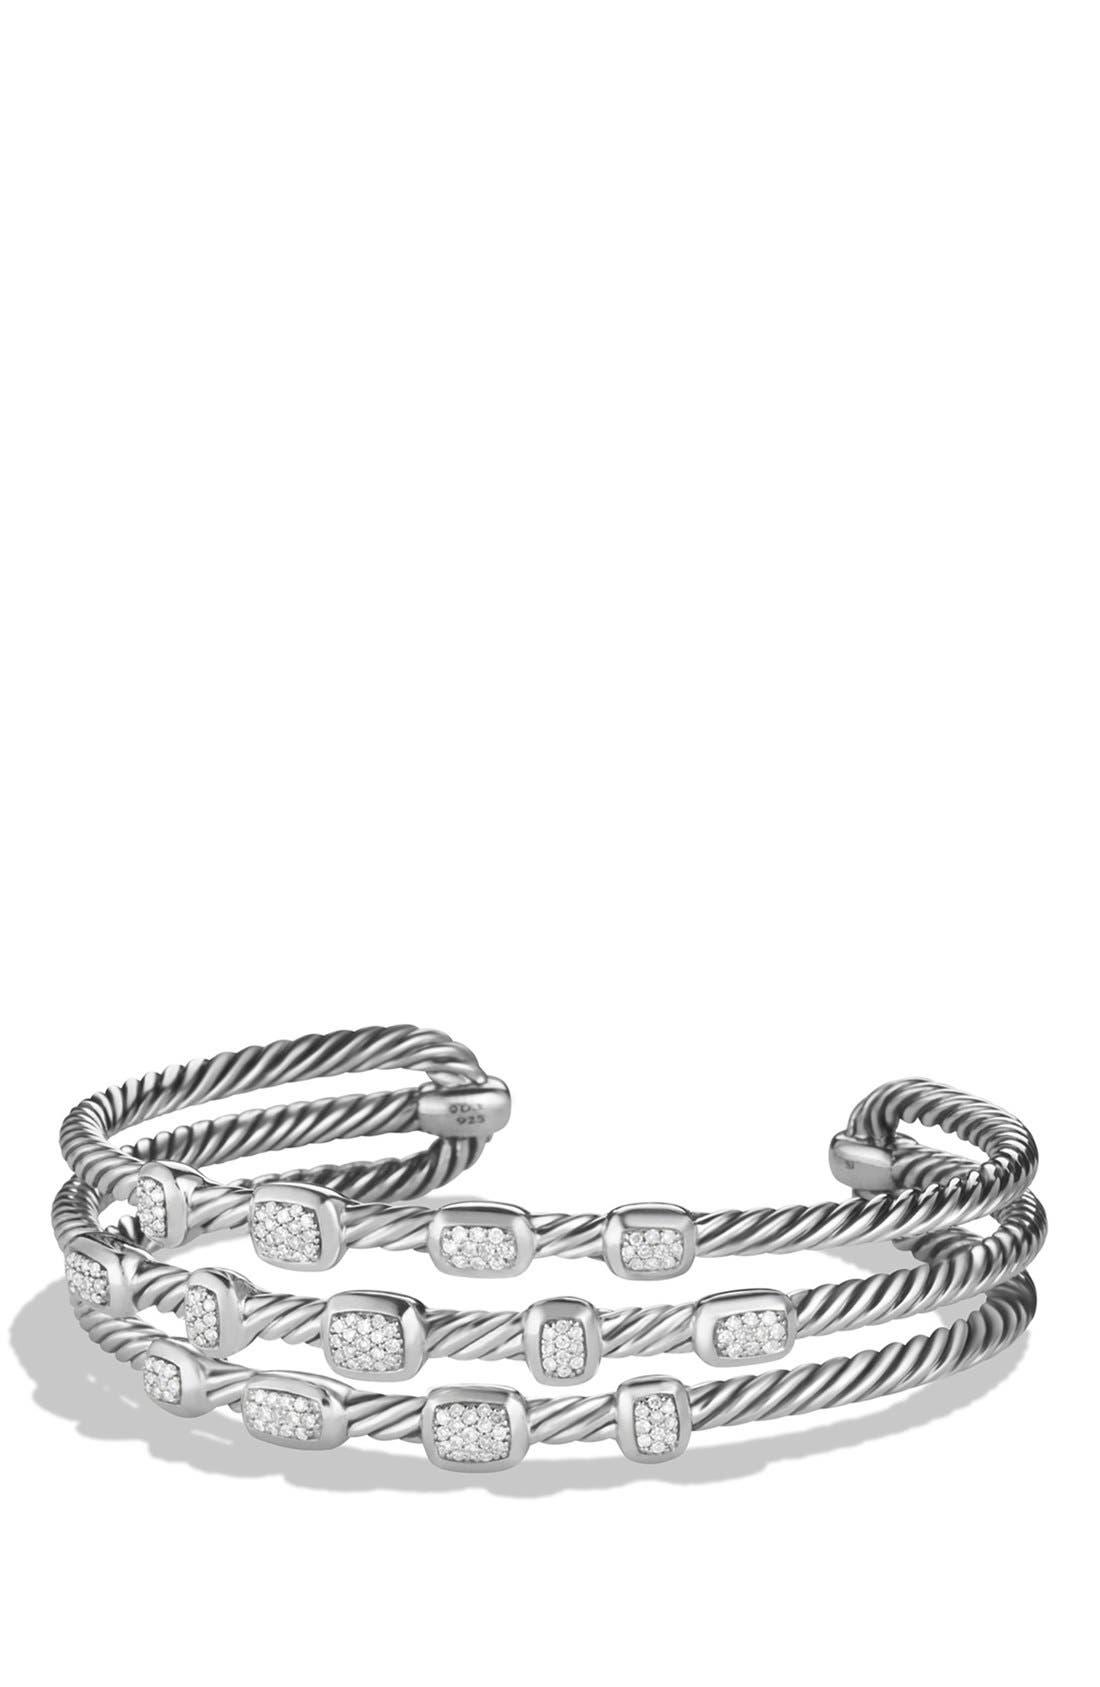 DAVID YURMAN Confetti Narrow Cuff Bracelet with Diamond